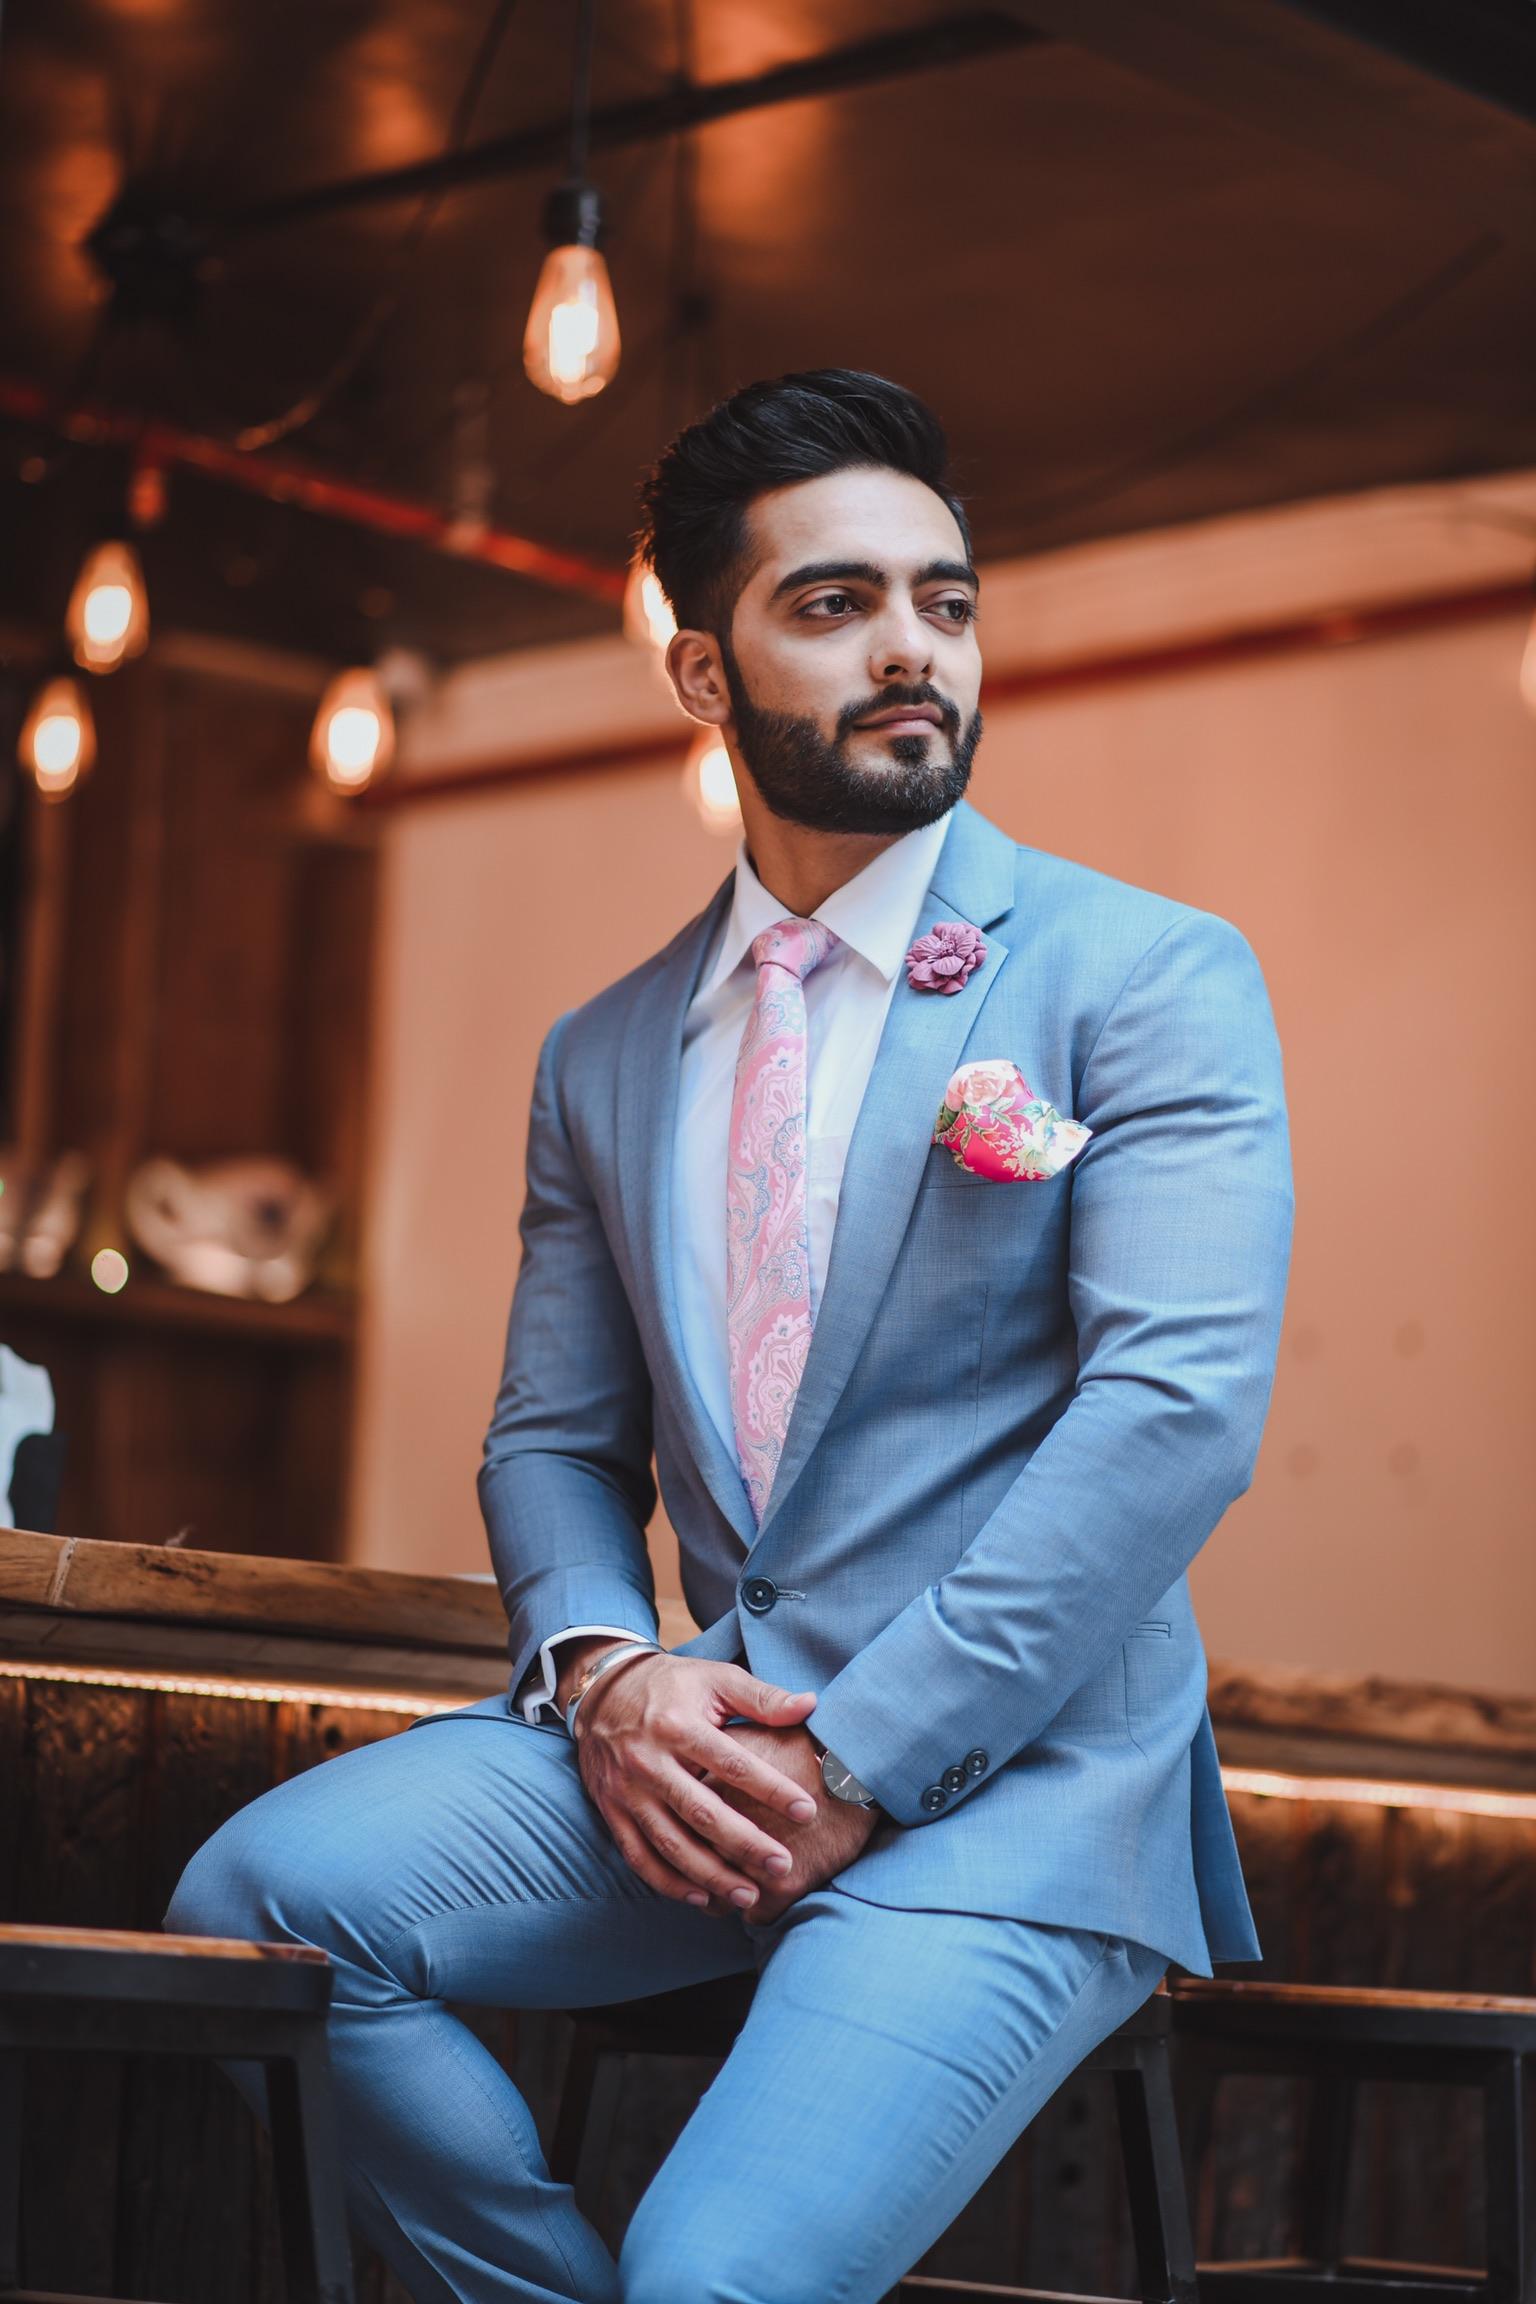 Gopalsons-Suit-Tie